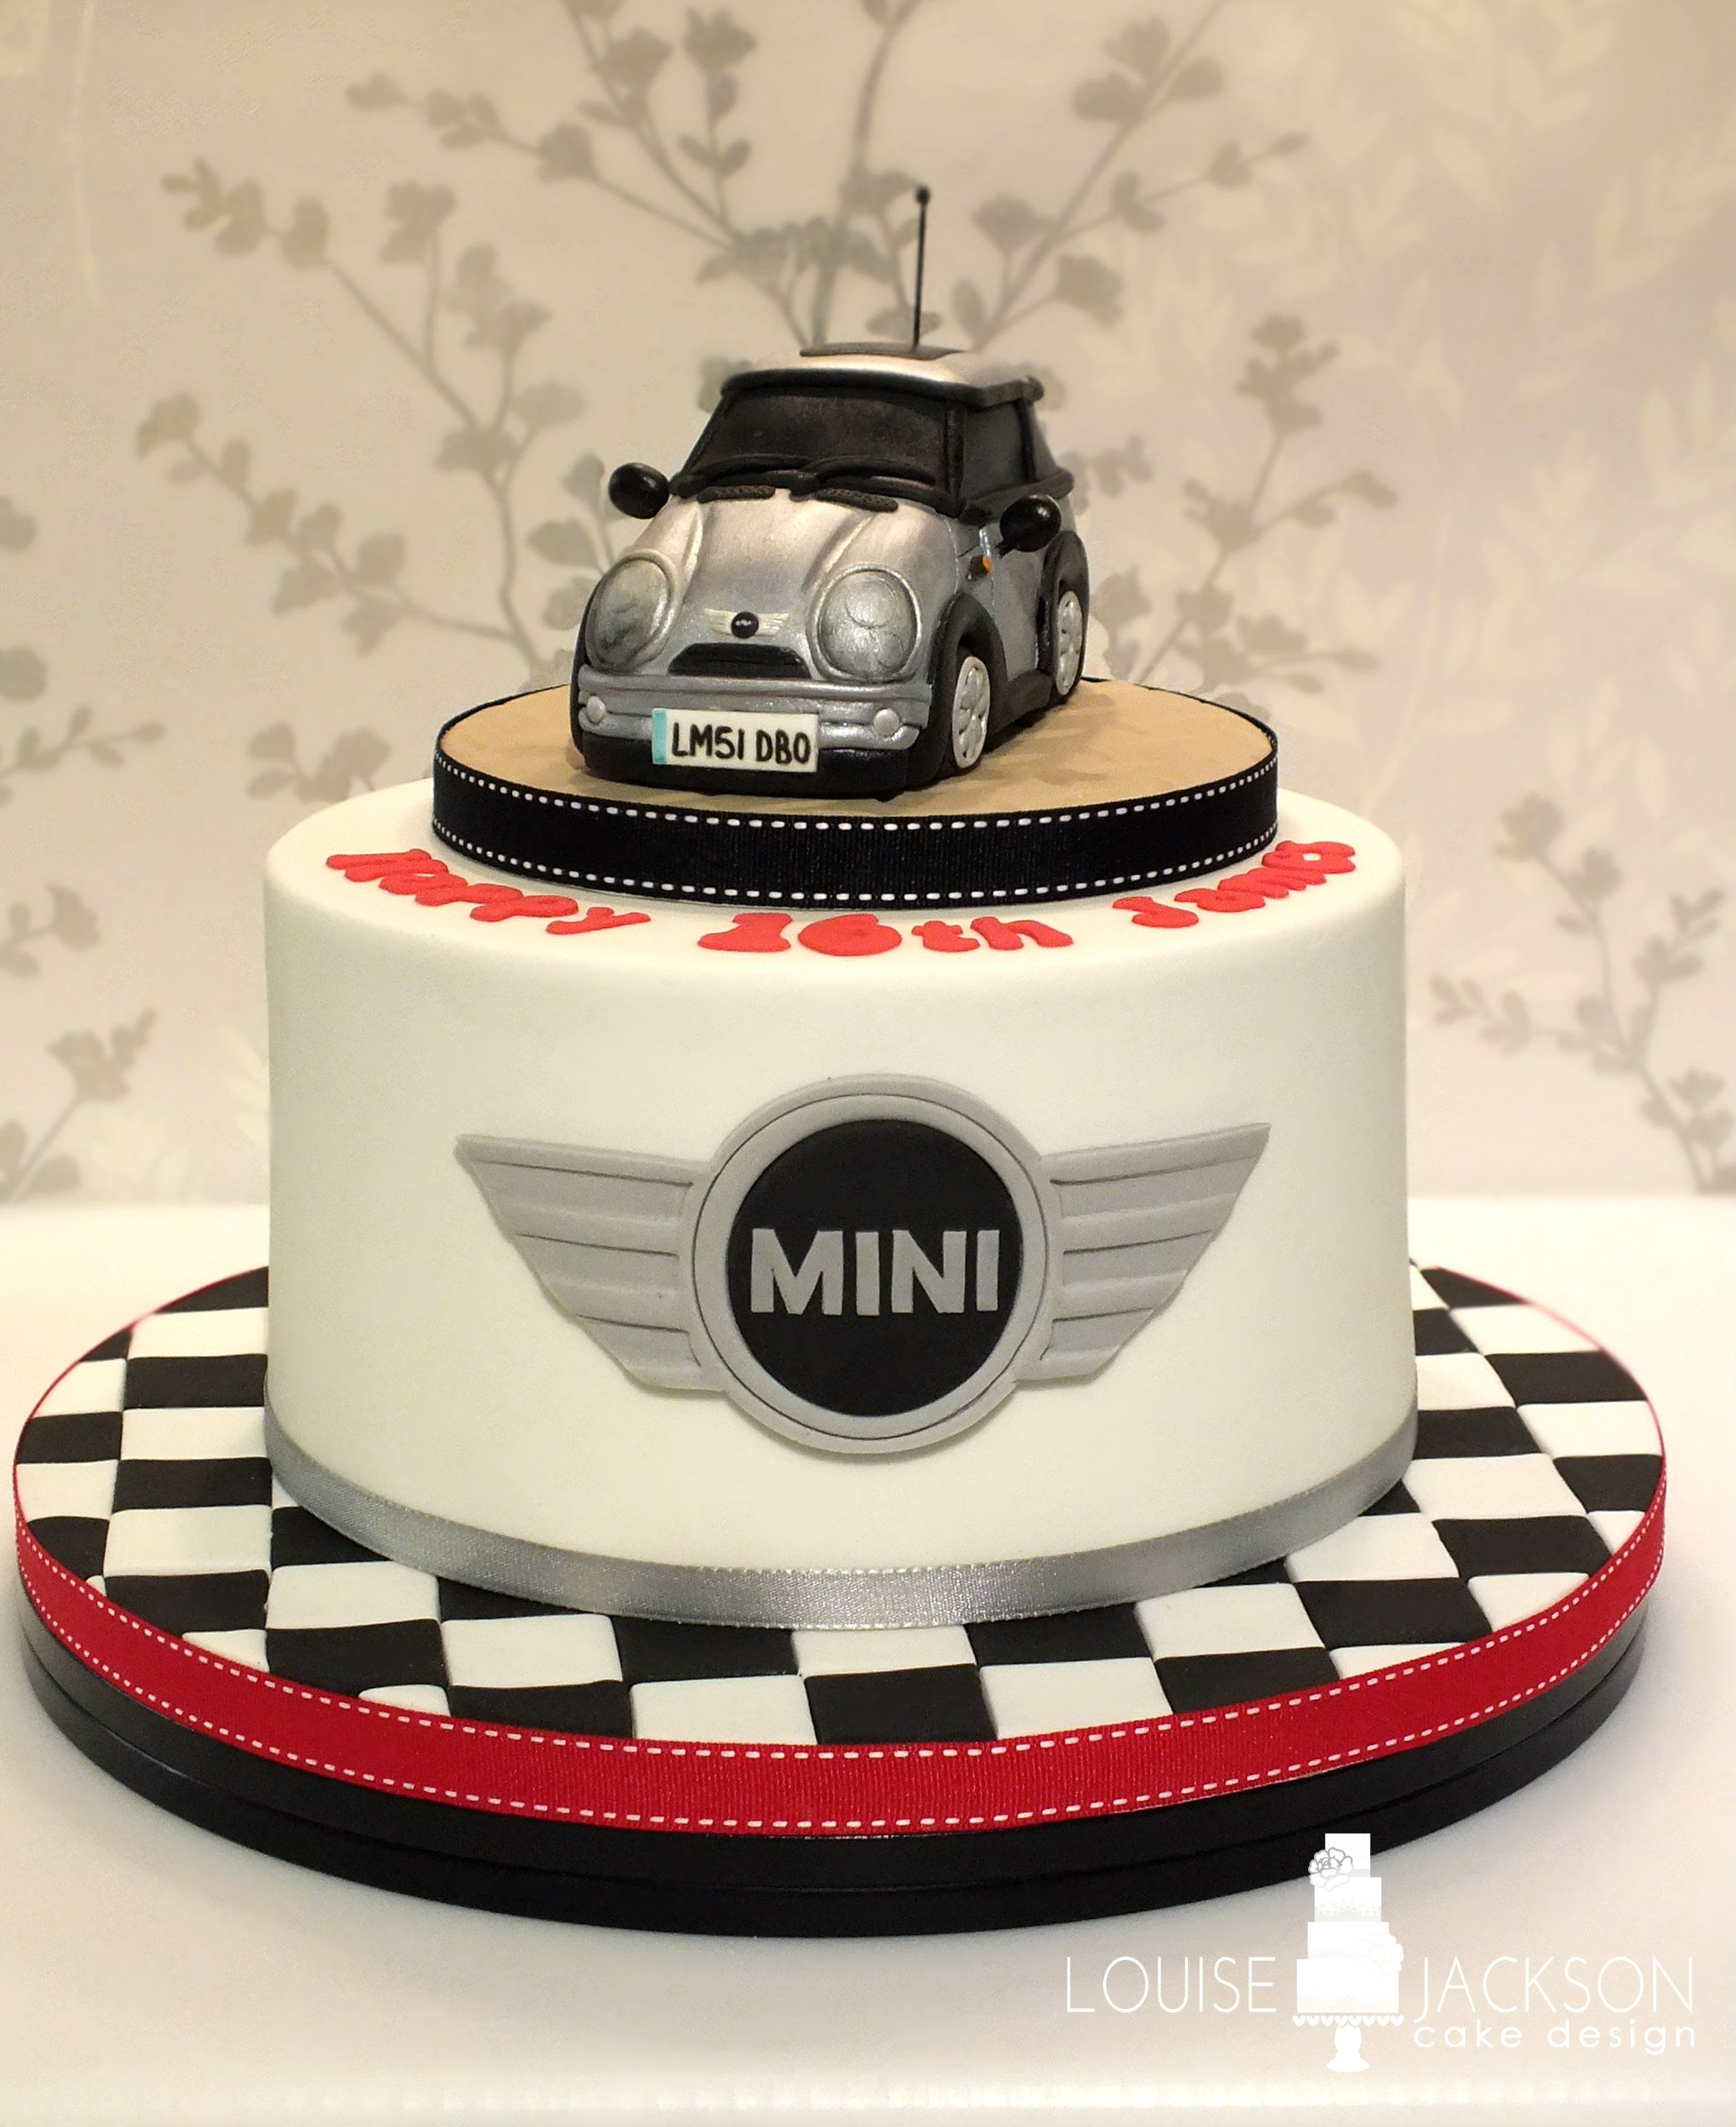 Mini car cake with chequered board and mini logo Celebration Cakes